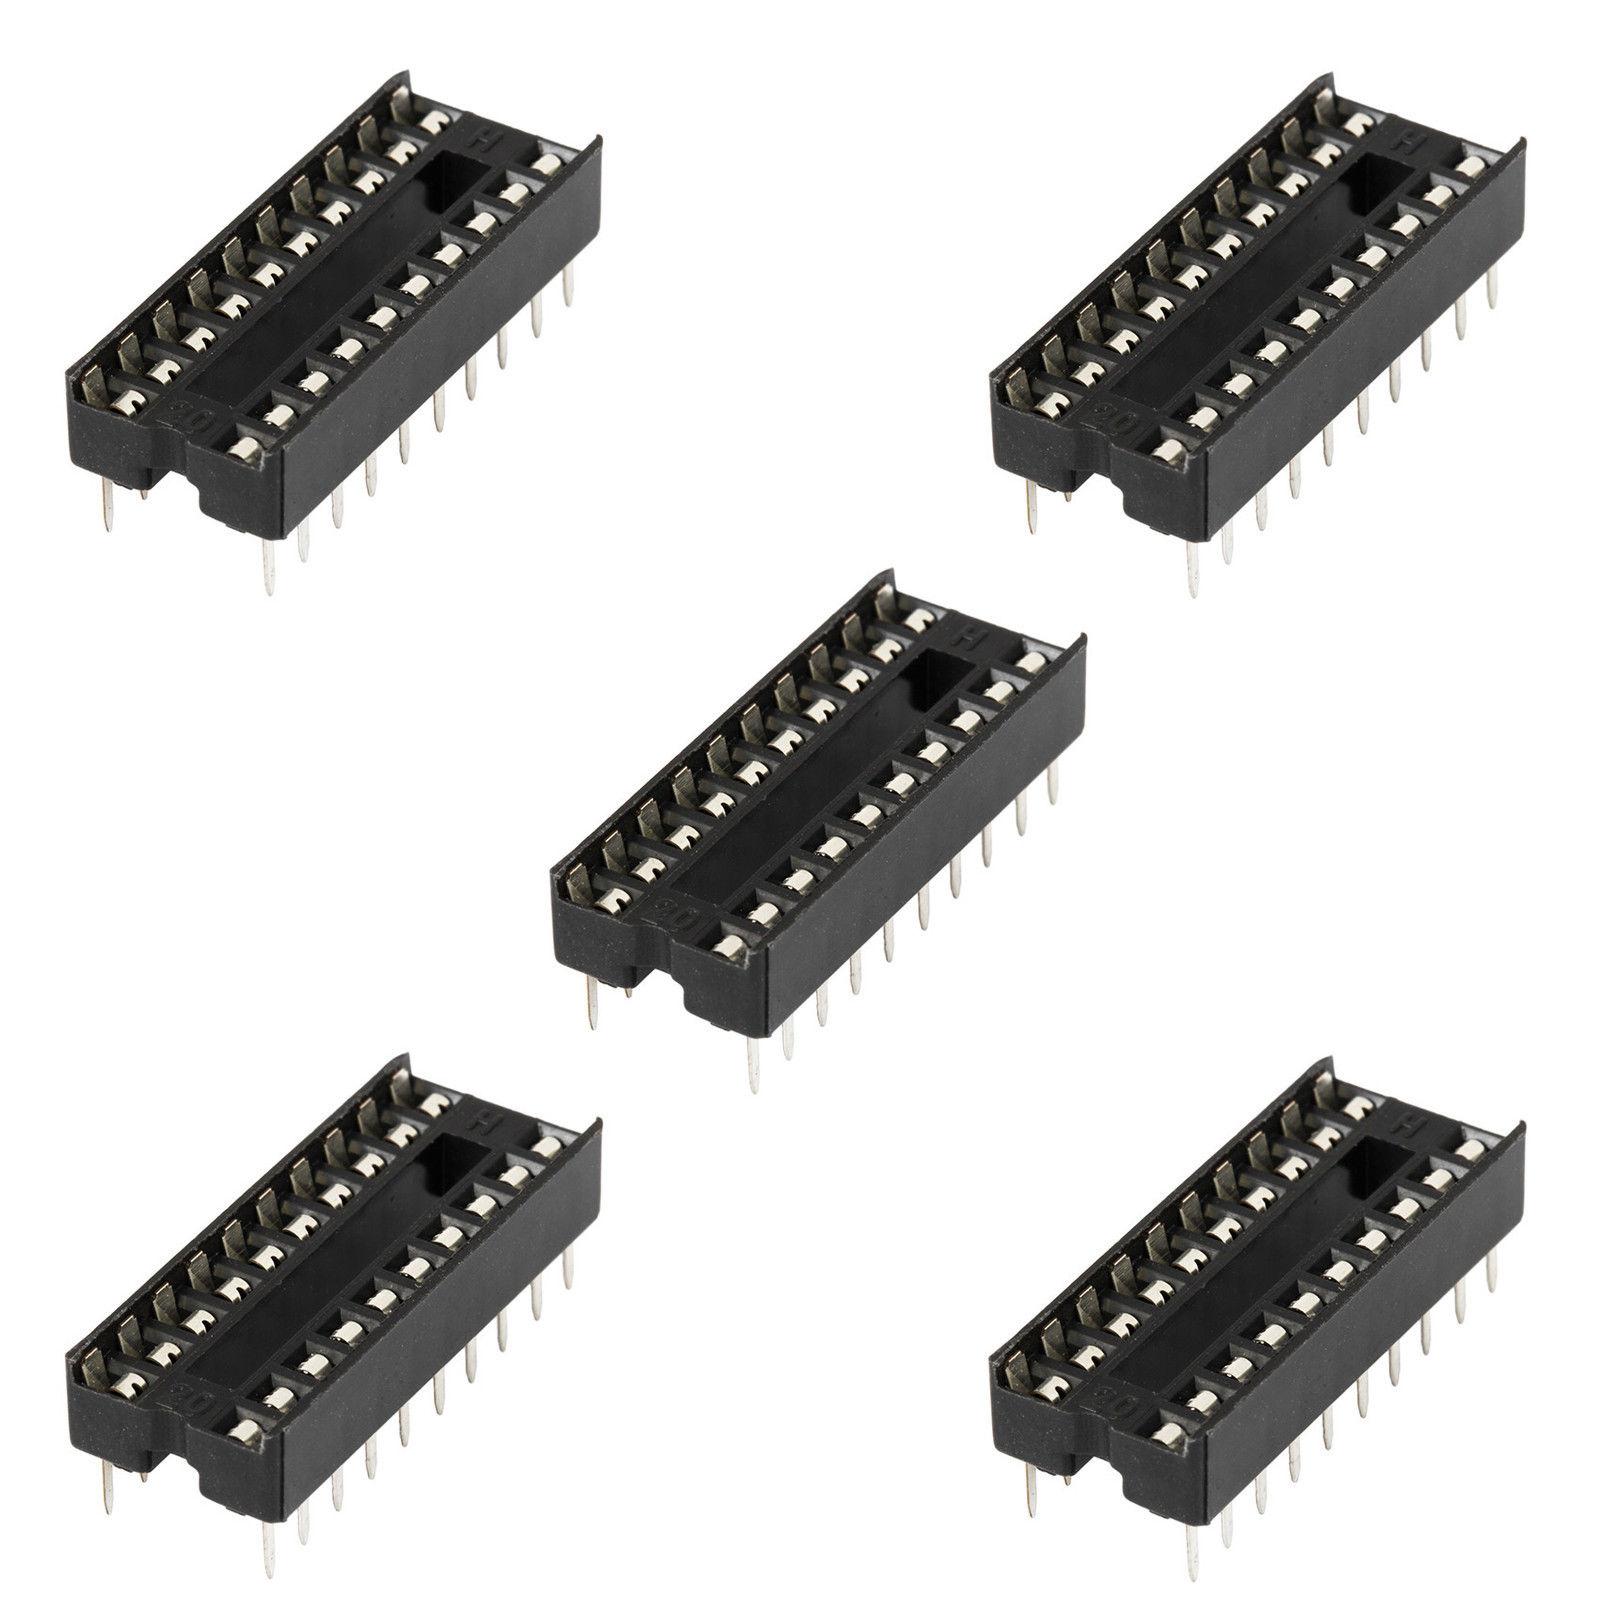 5 x 16-Pin DIP DIL PCB IC Socket